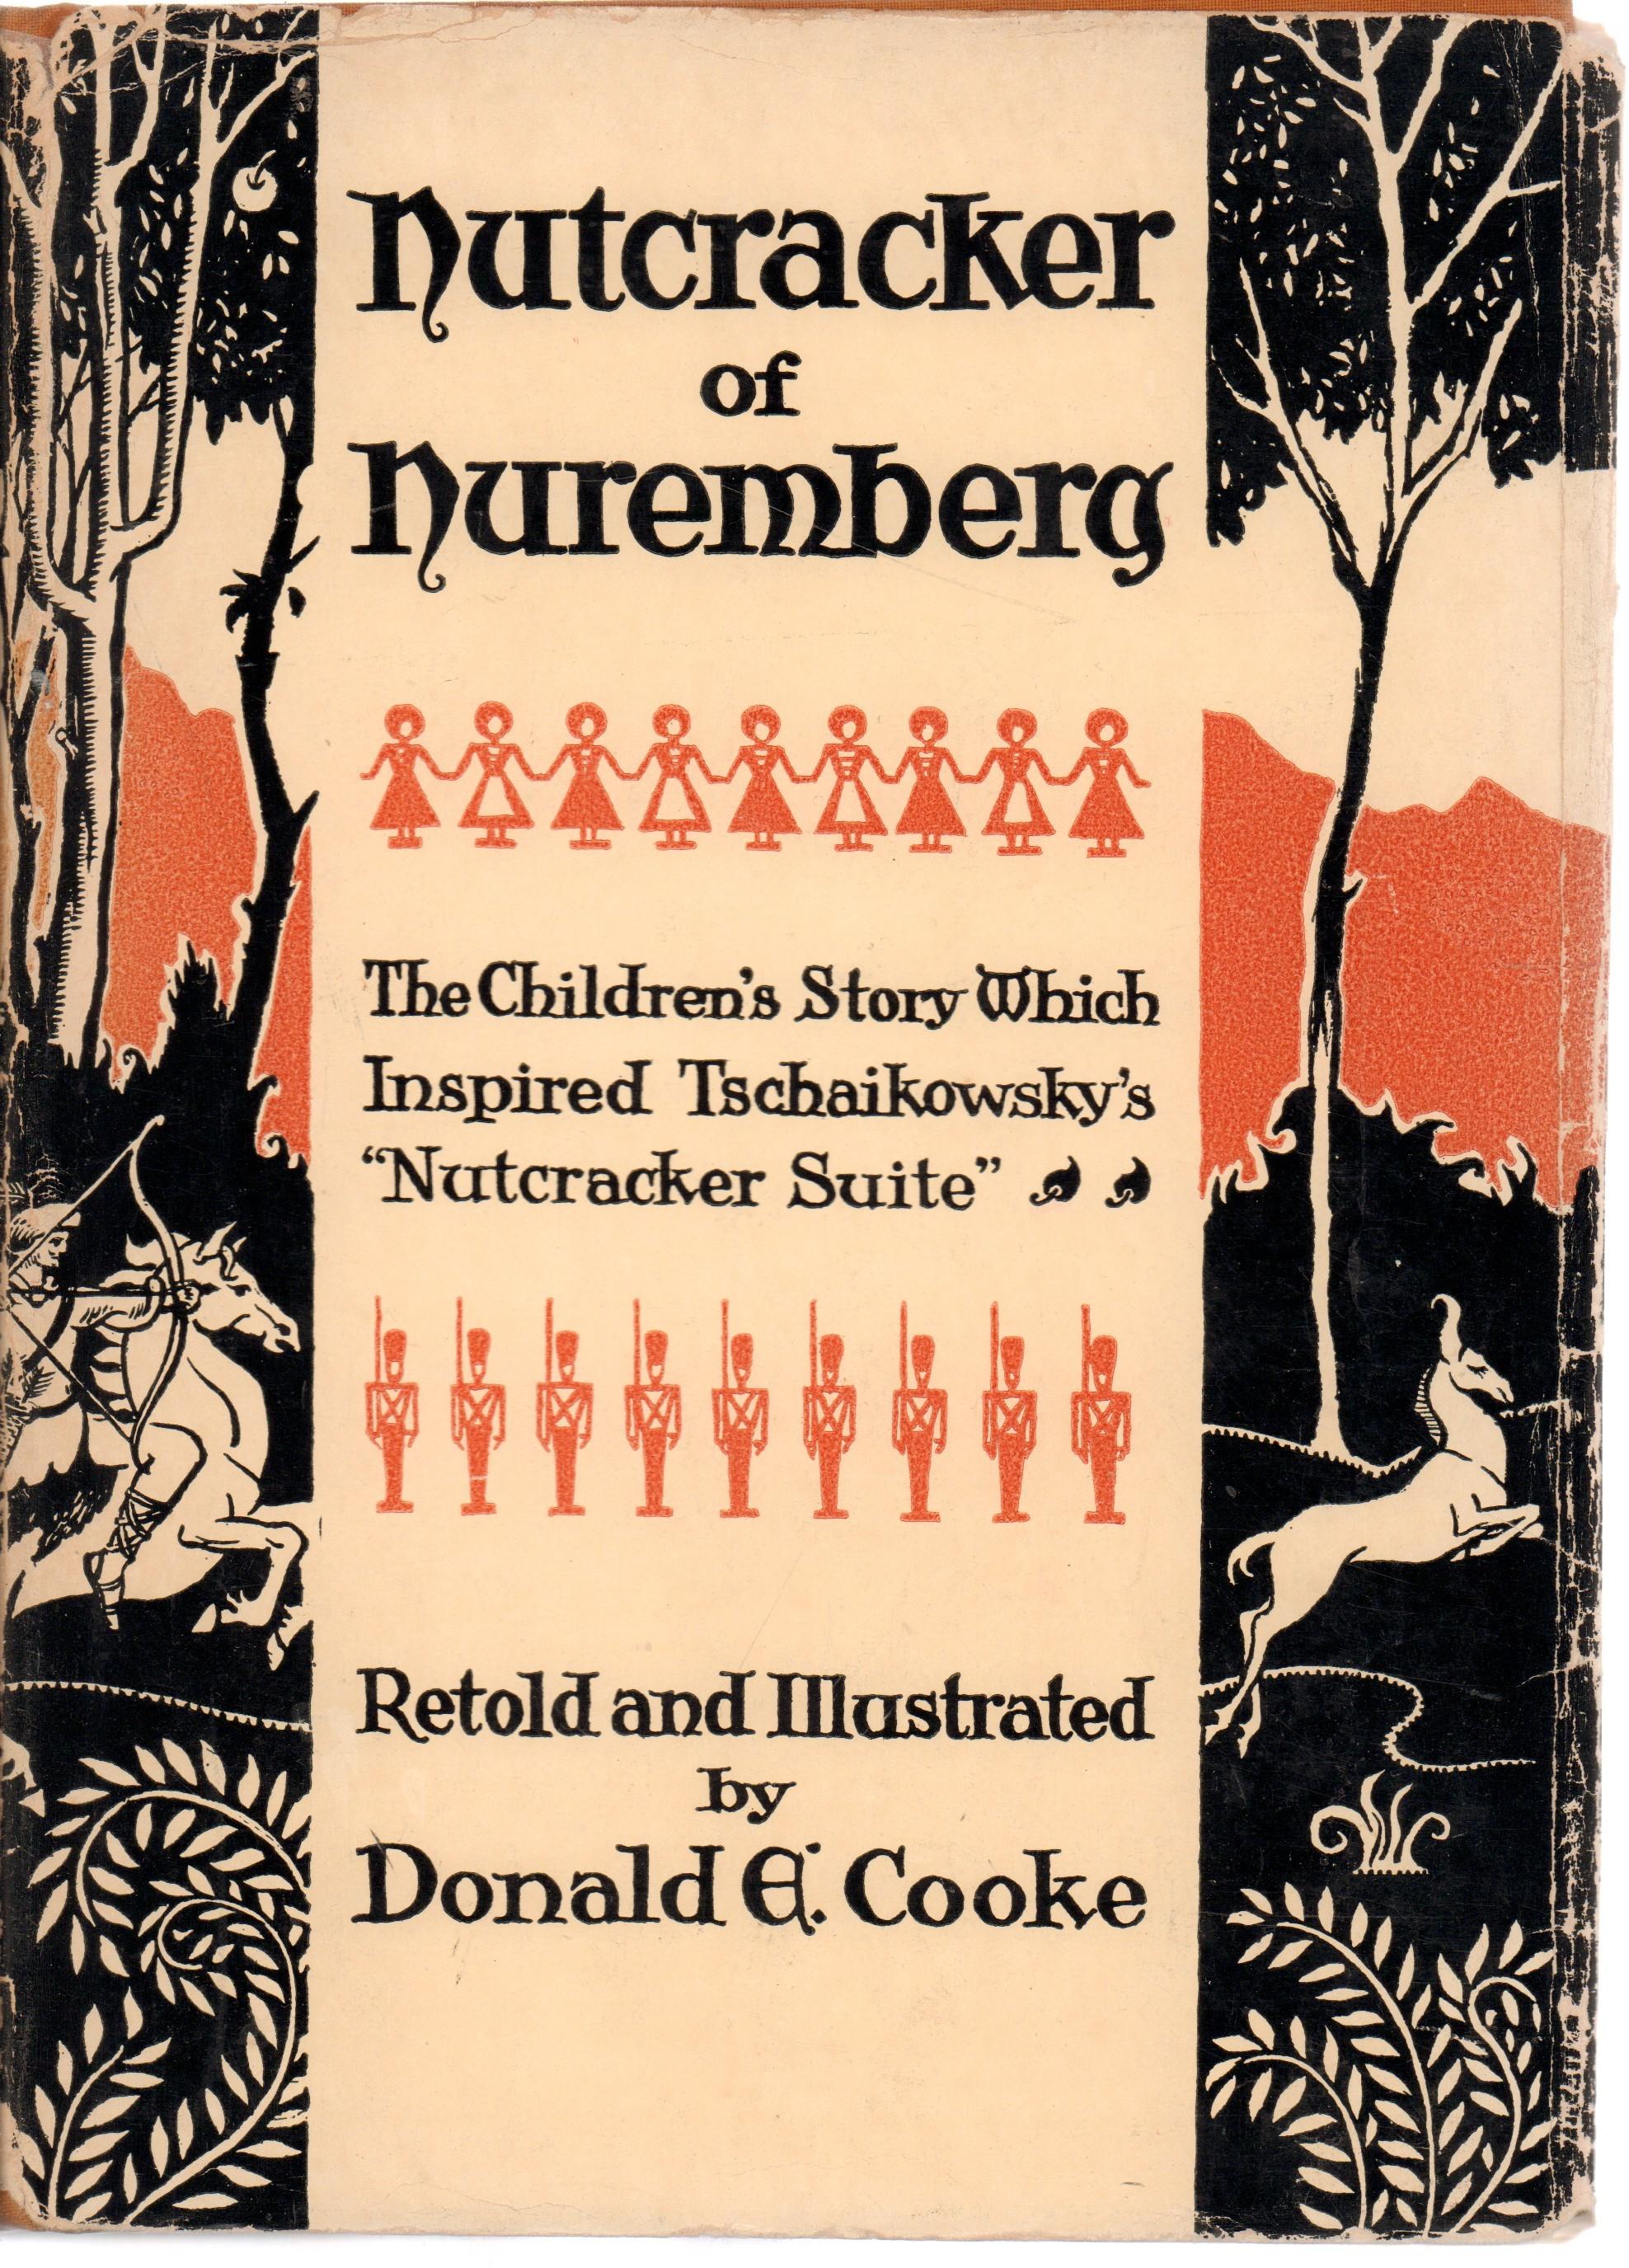 Nutcracker of nuremberg by donald e cooke chairish for Sofa global 6450